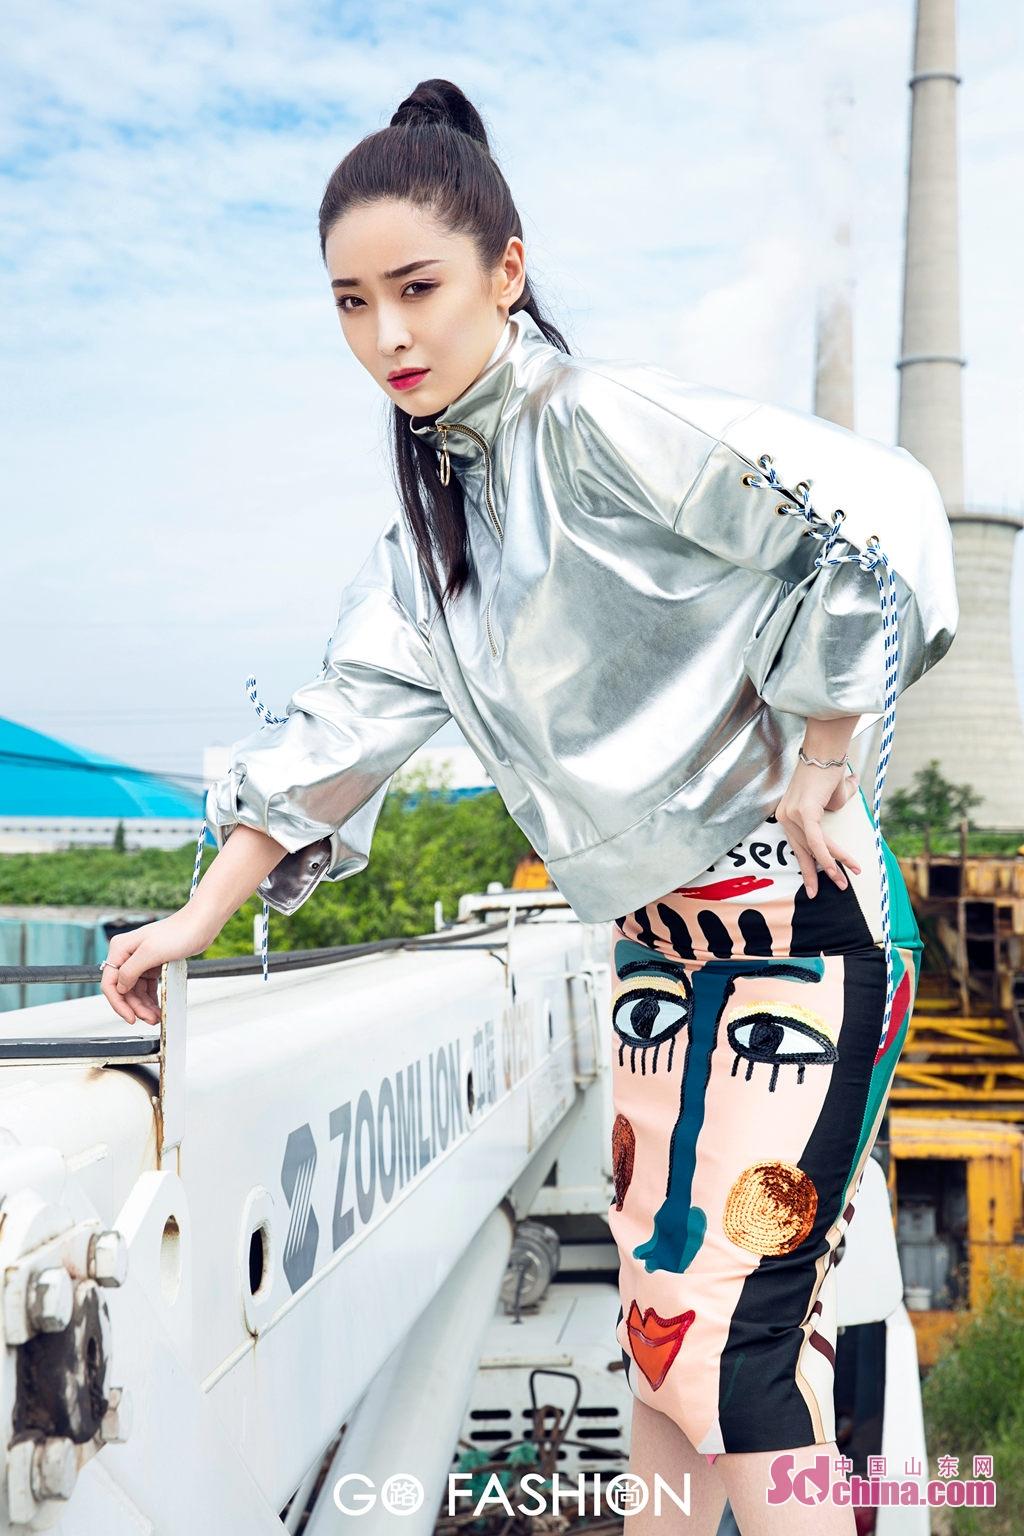 <br/>  近日,李曼的一组全新封面大片曝光,片中李曼个性演绎多变时尚风格,无论是Oversize银色外套搭配印花窄裙还是白色吊带马甲搭配紫色leggings她都能轻松驾驭,率性飒爽不失性感,完美诠释摩登前卫&amp;ldquo;飒女孩&amp;rdquo;。镜头下的她眼神凌厉,姿态不羁,两米八长腿展露无遗;在工业机械背景衬托下更显酷girl魅力,气场全开,时尚态度满分。<br/>